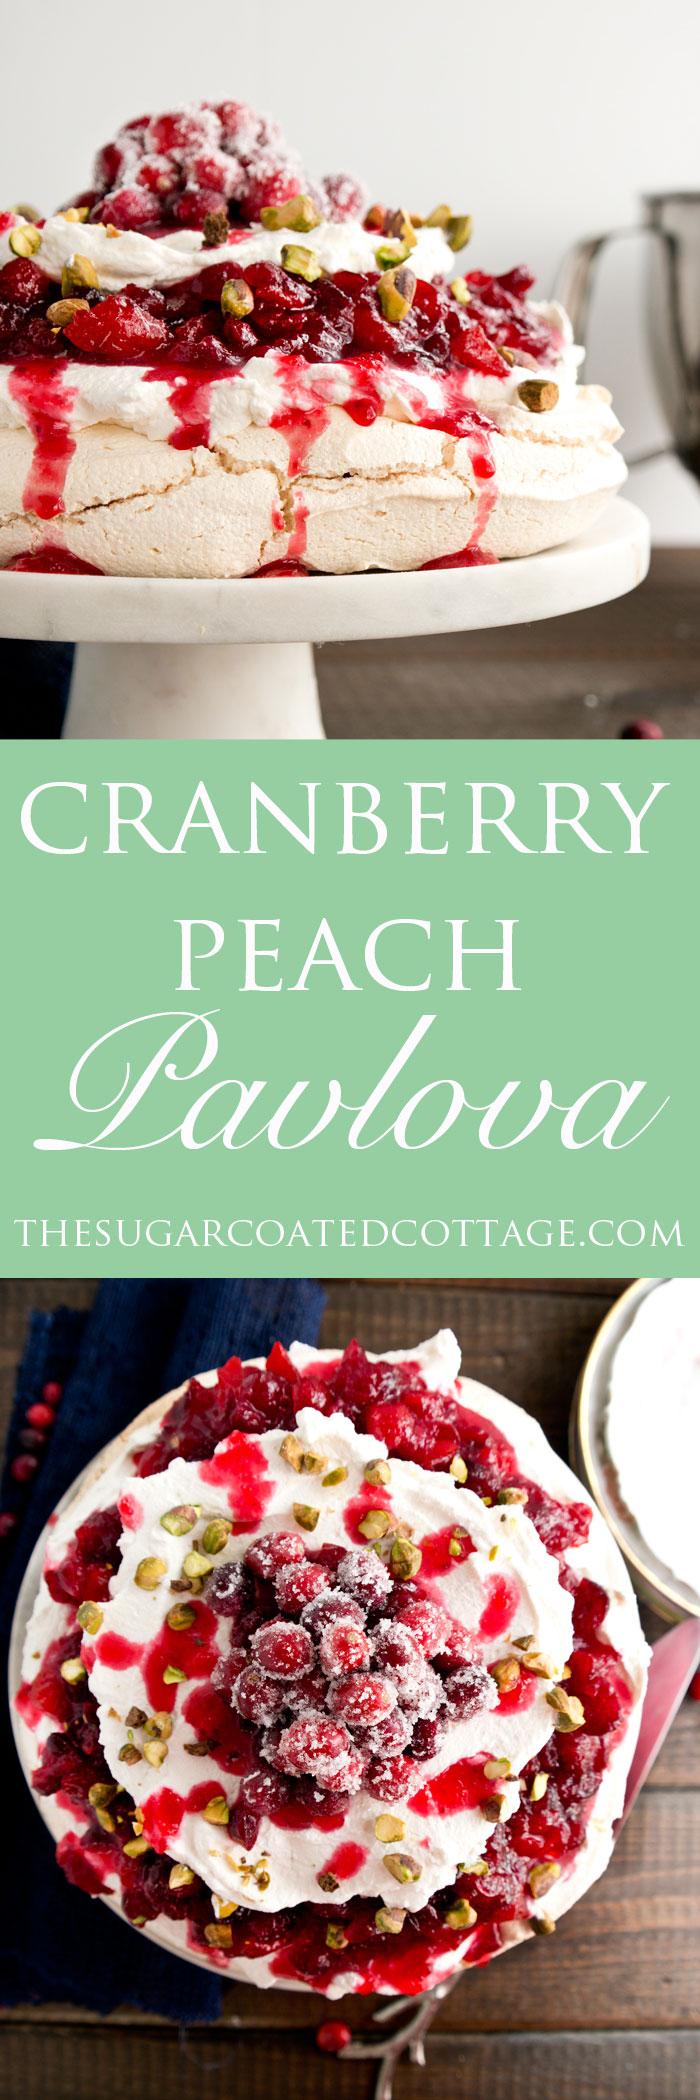 Cranberry Peach Pavlova